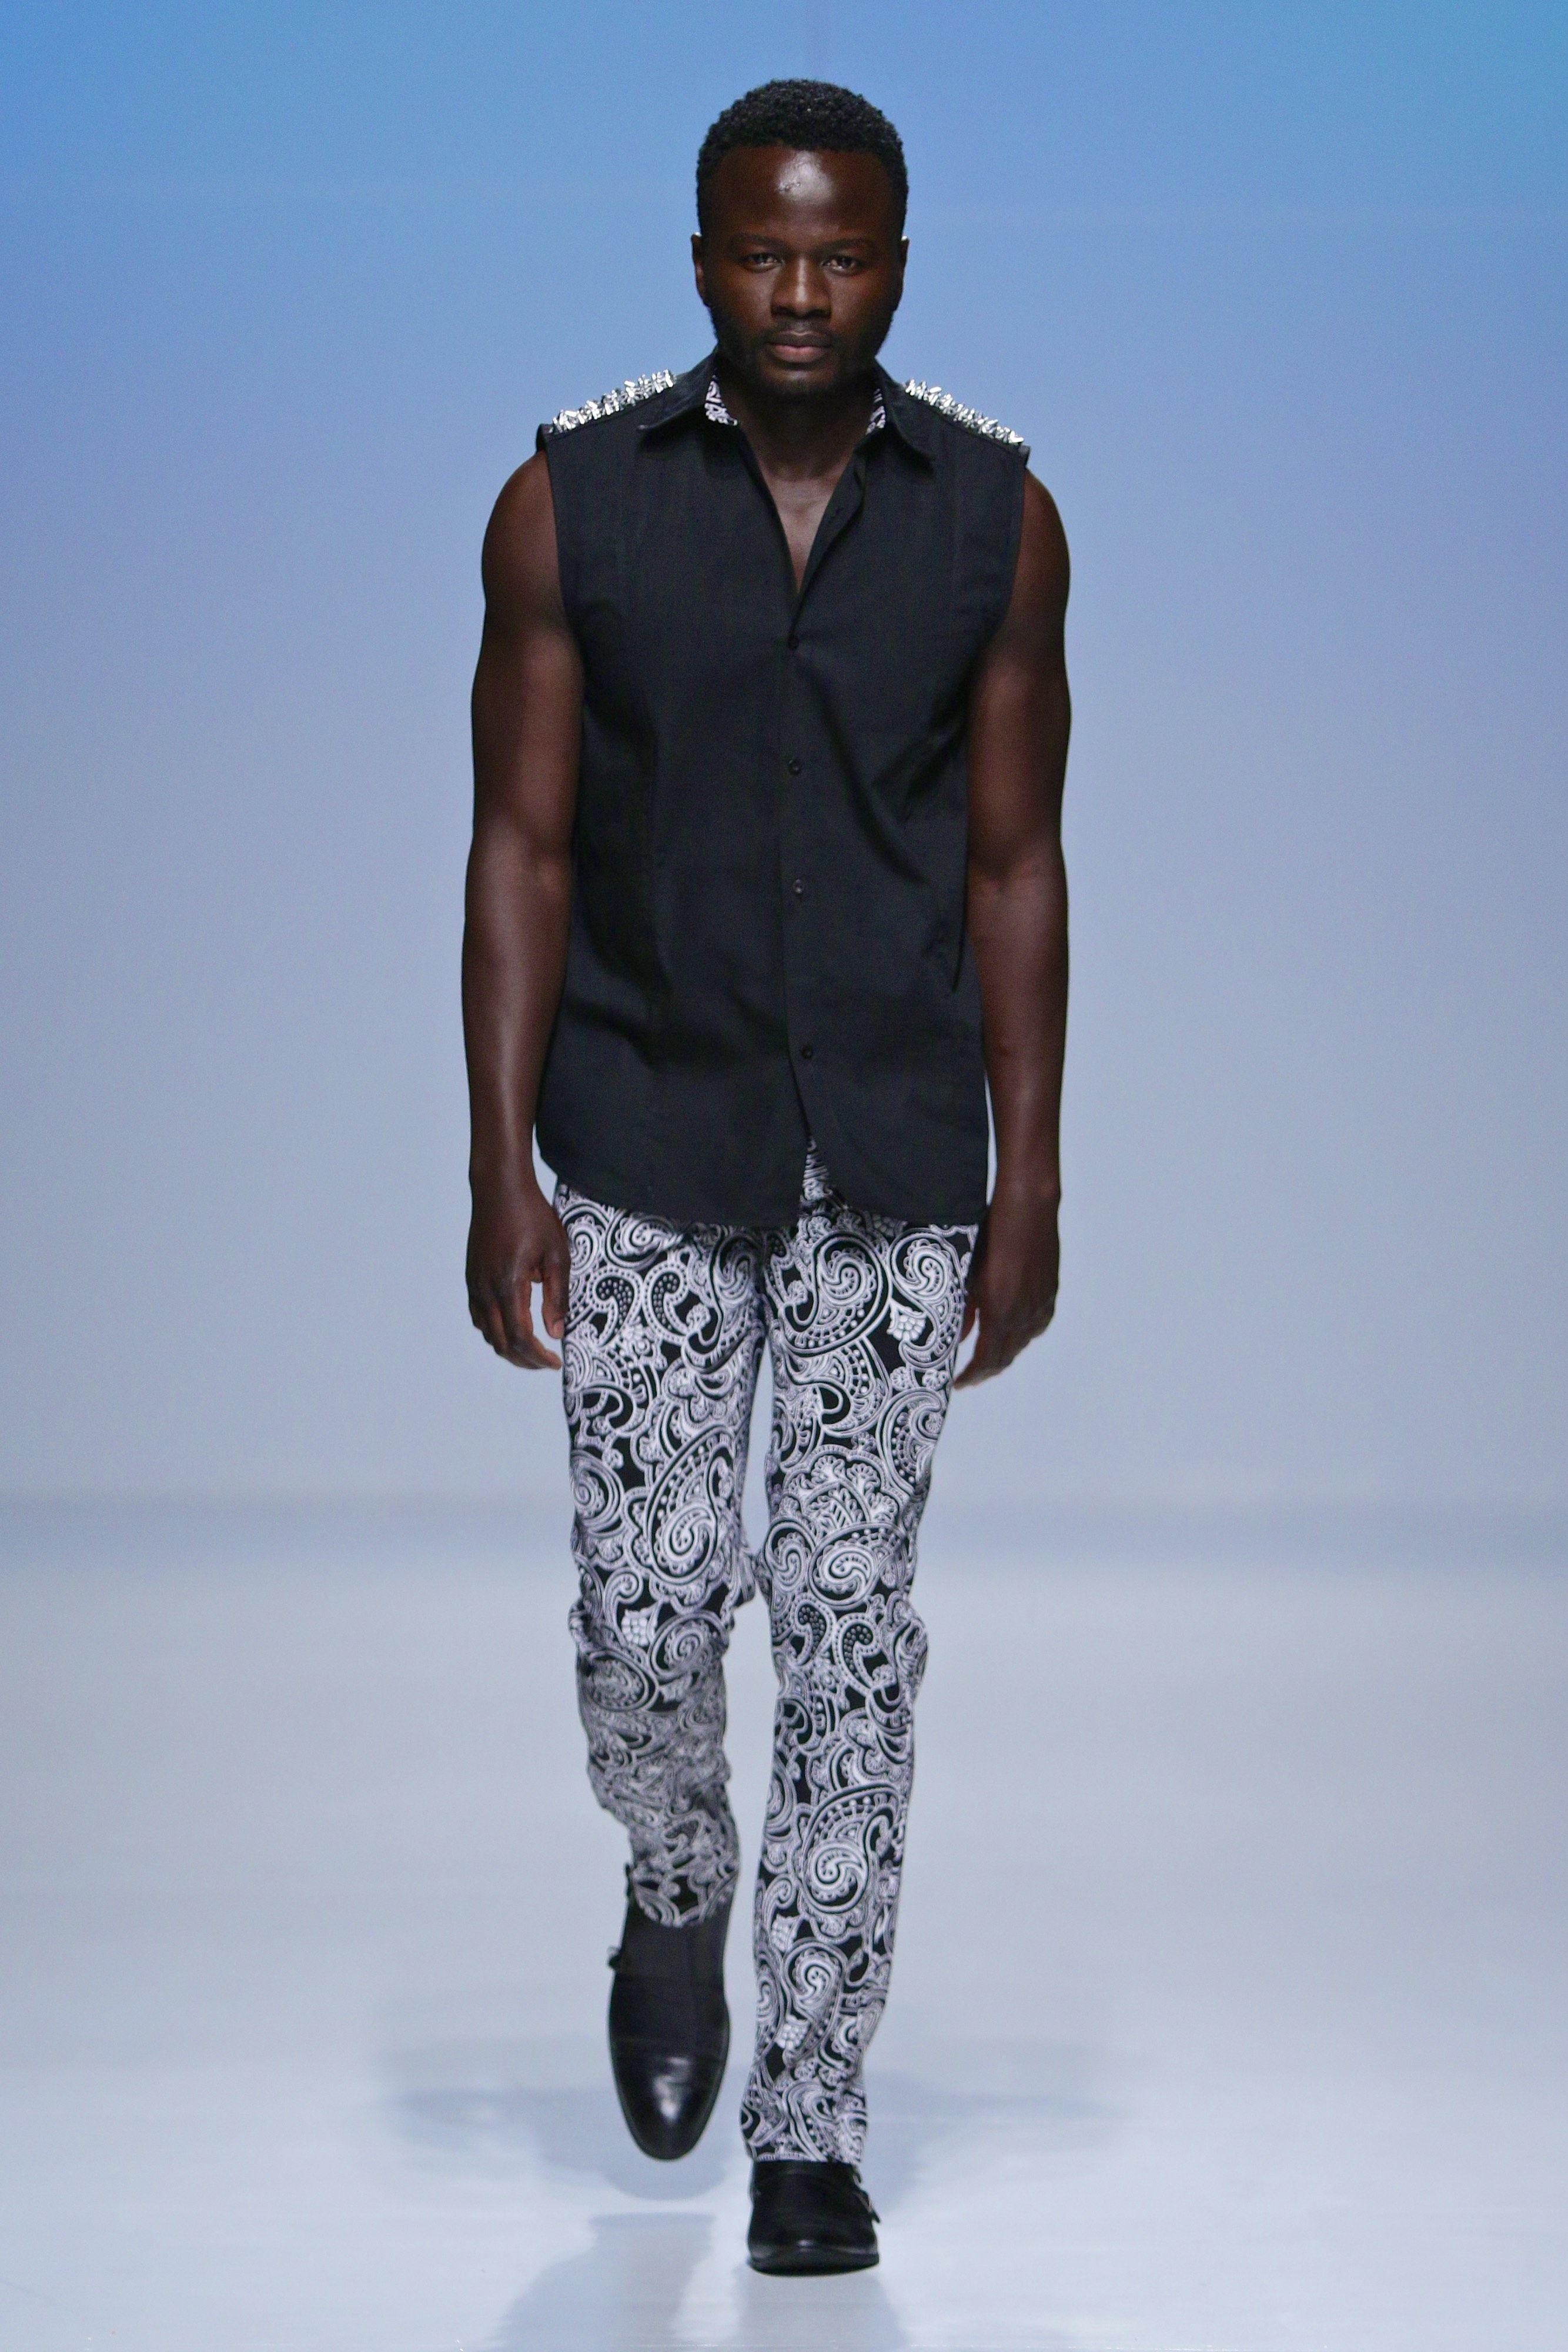 Shadow by Sidumiso #Menswear #Trends #Tendencias #Moda Hombre - #DFF2015 #Durban Fashion Fair 2015